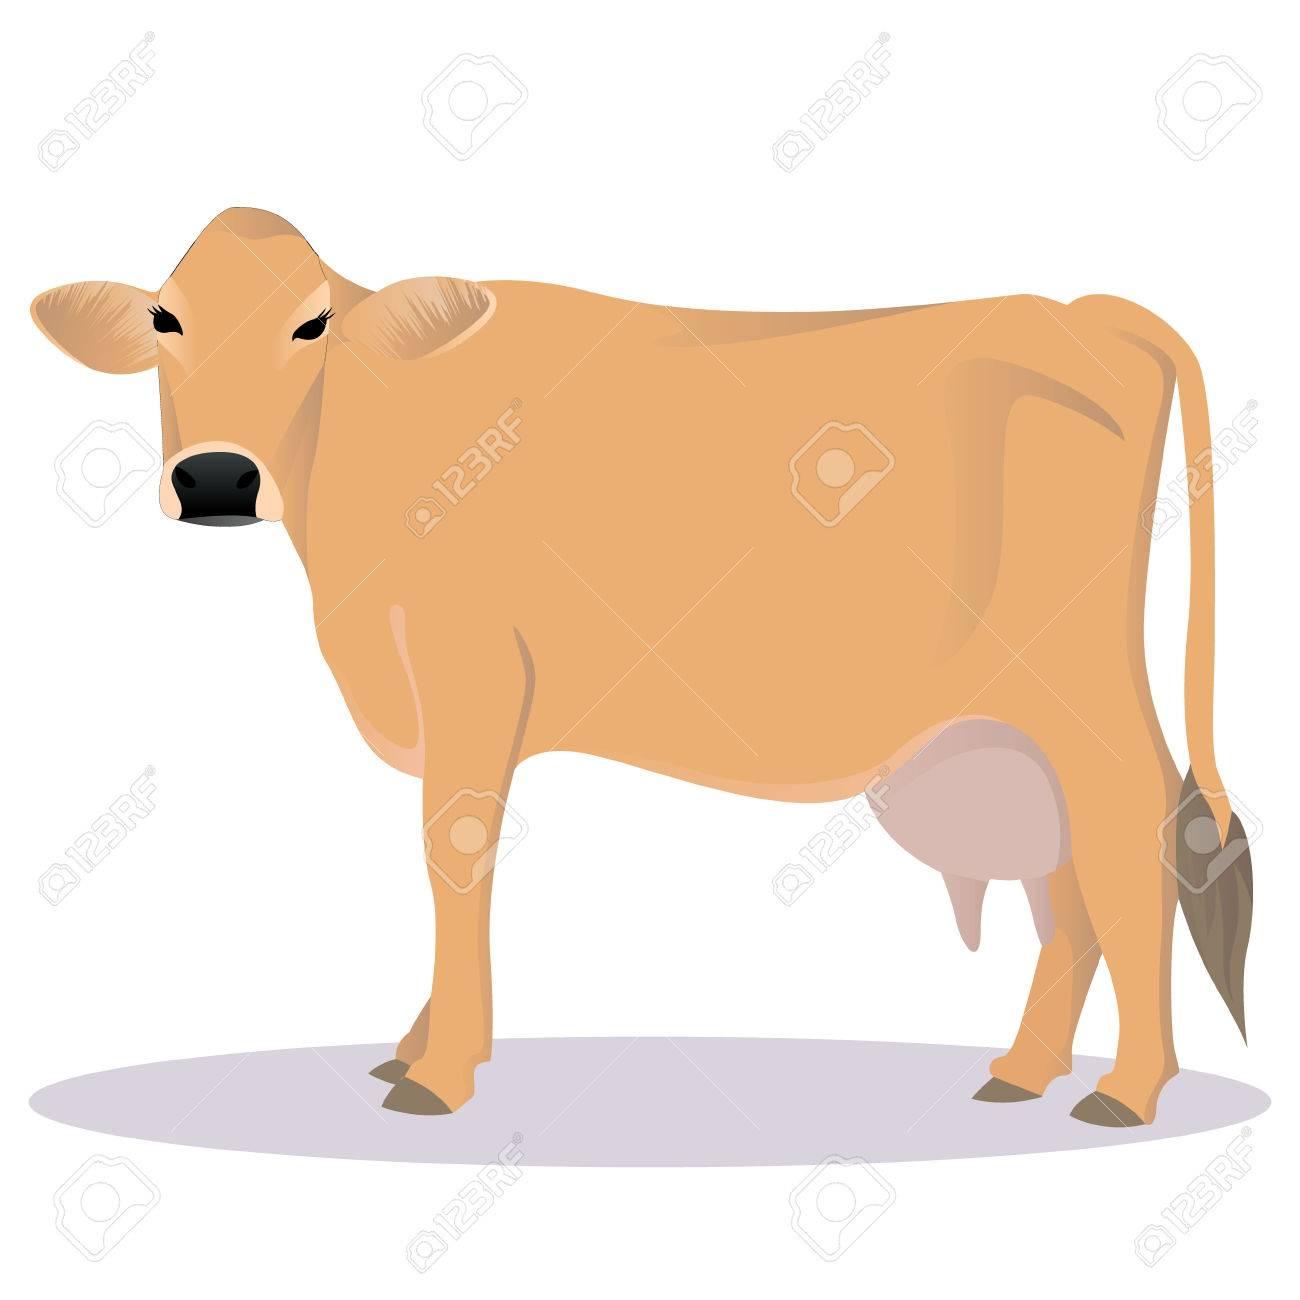 Jersey cattle vector illustration.